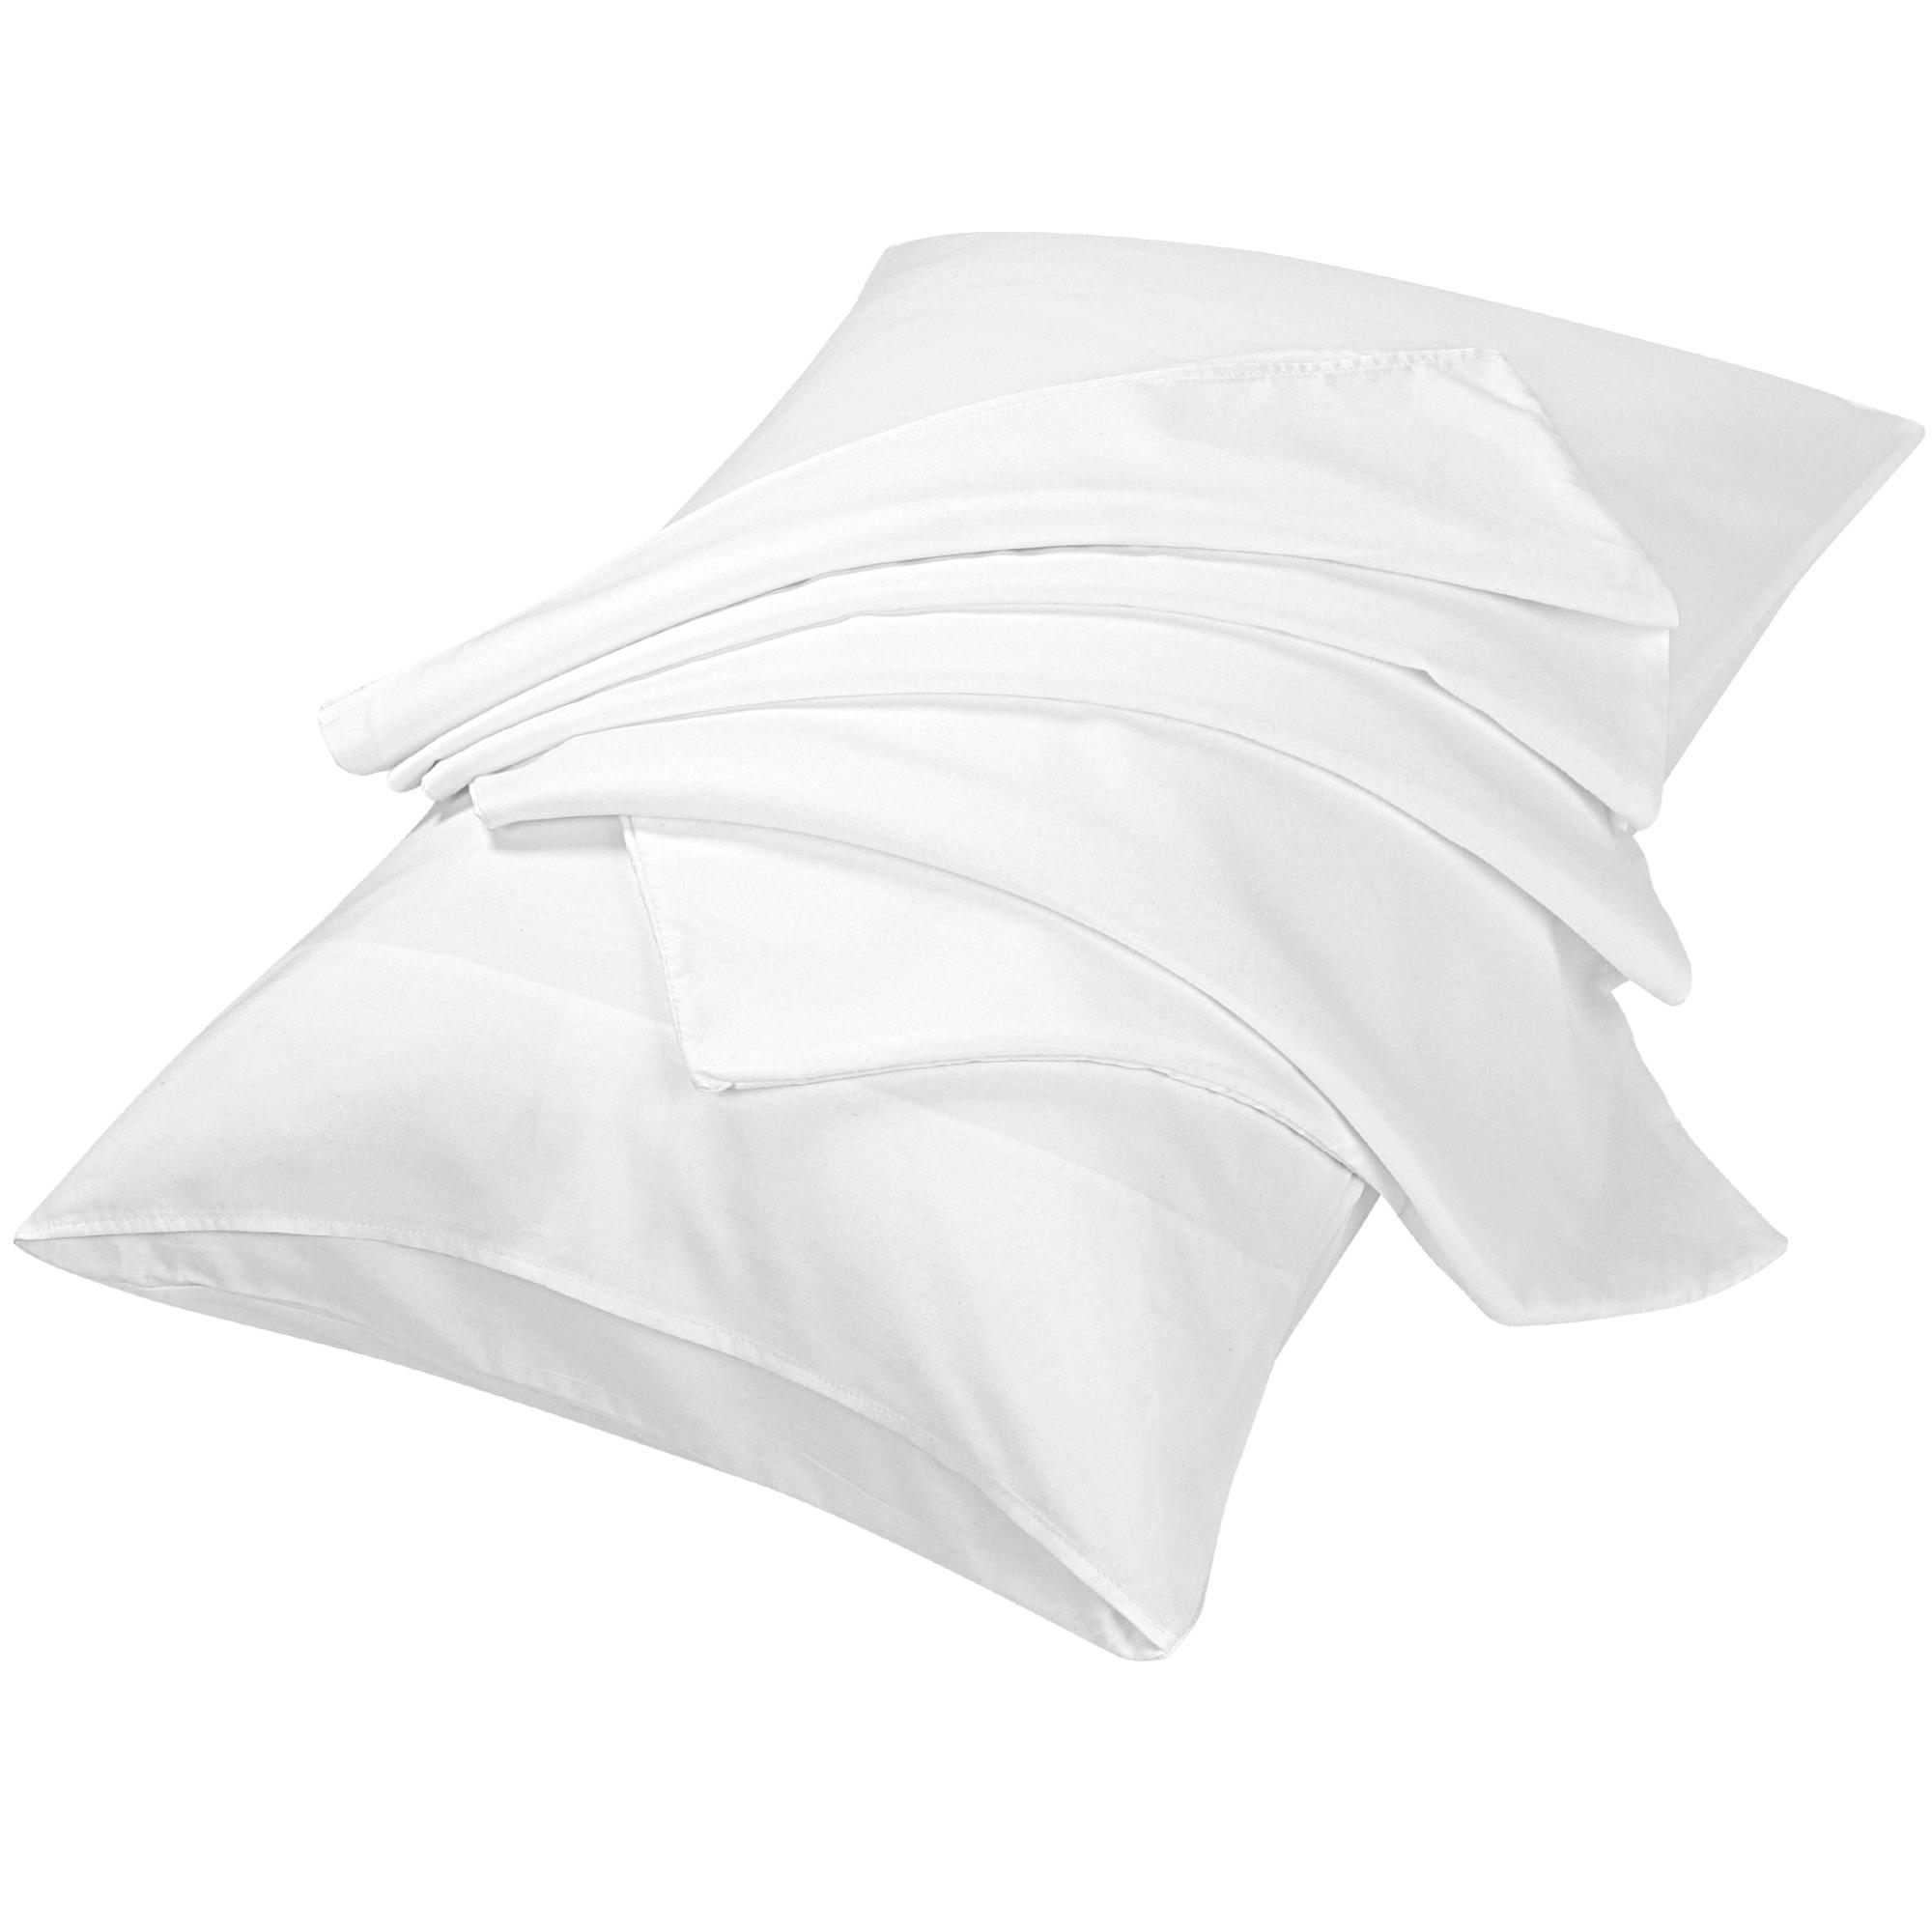 "2pcs Pillowcases Soft Microfiber, No Wrinkle, White Travel (14"" x 20"")"